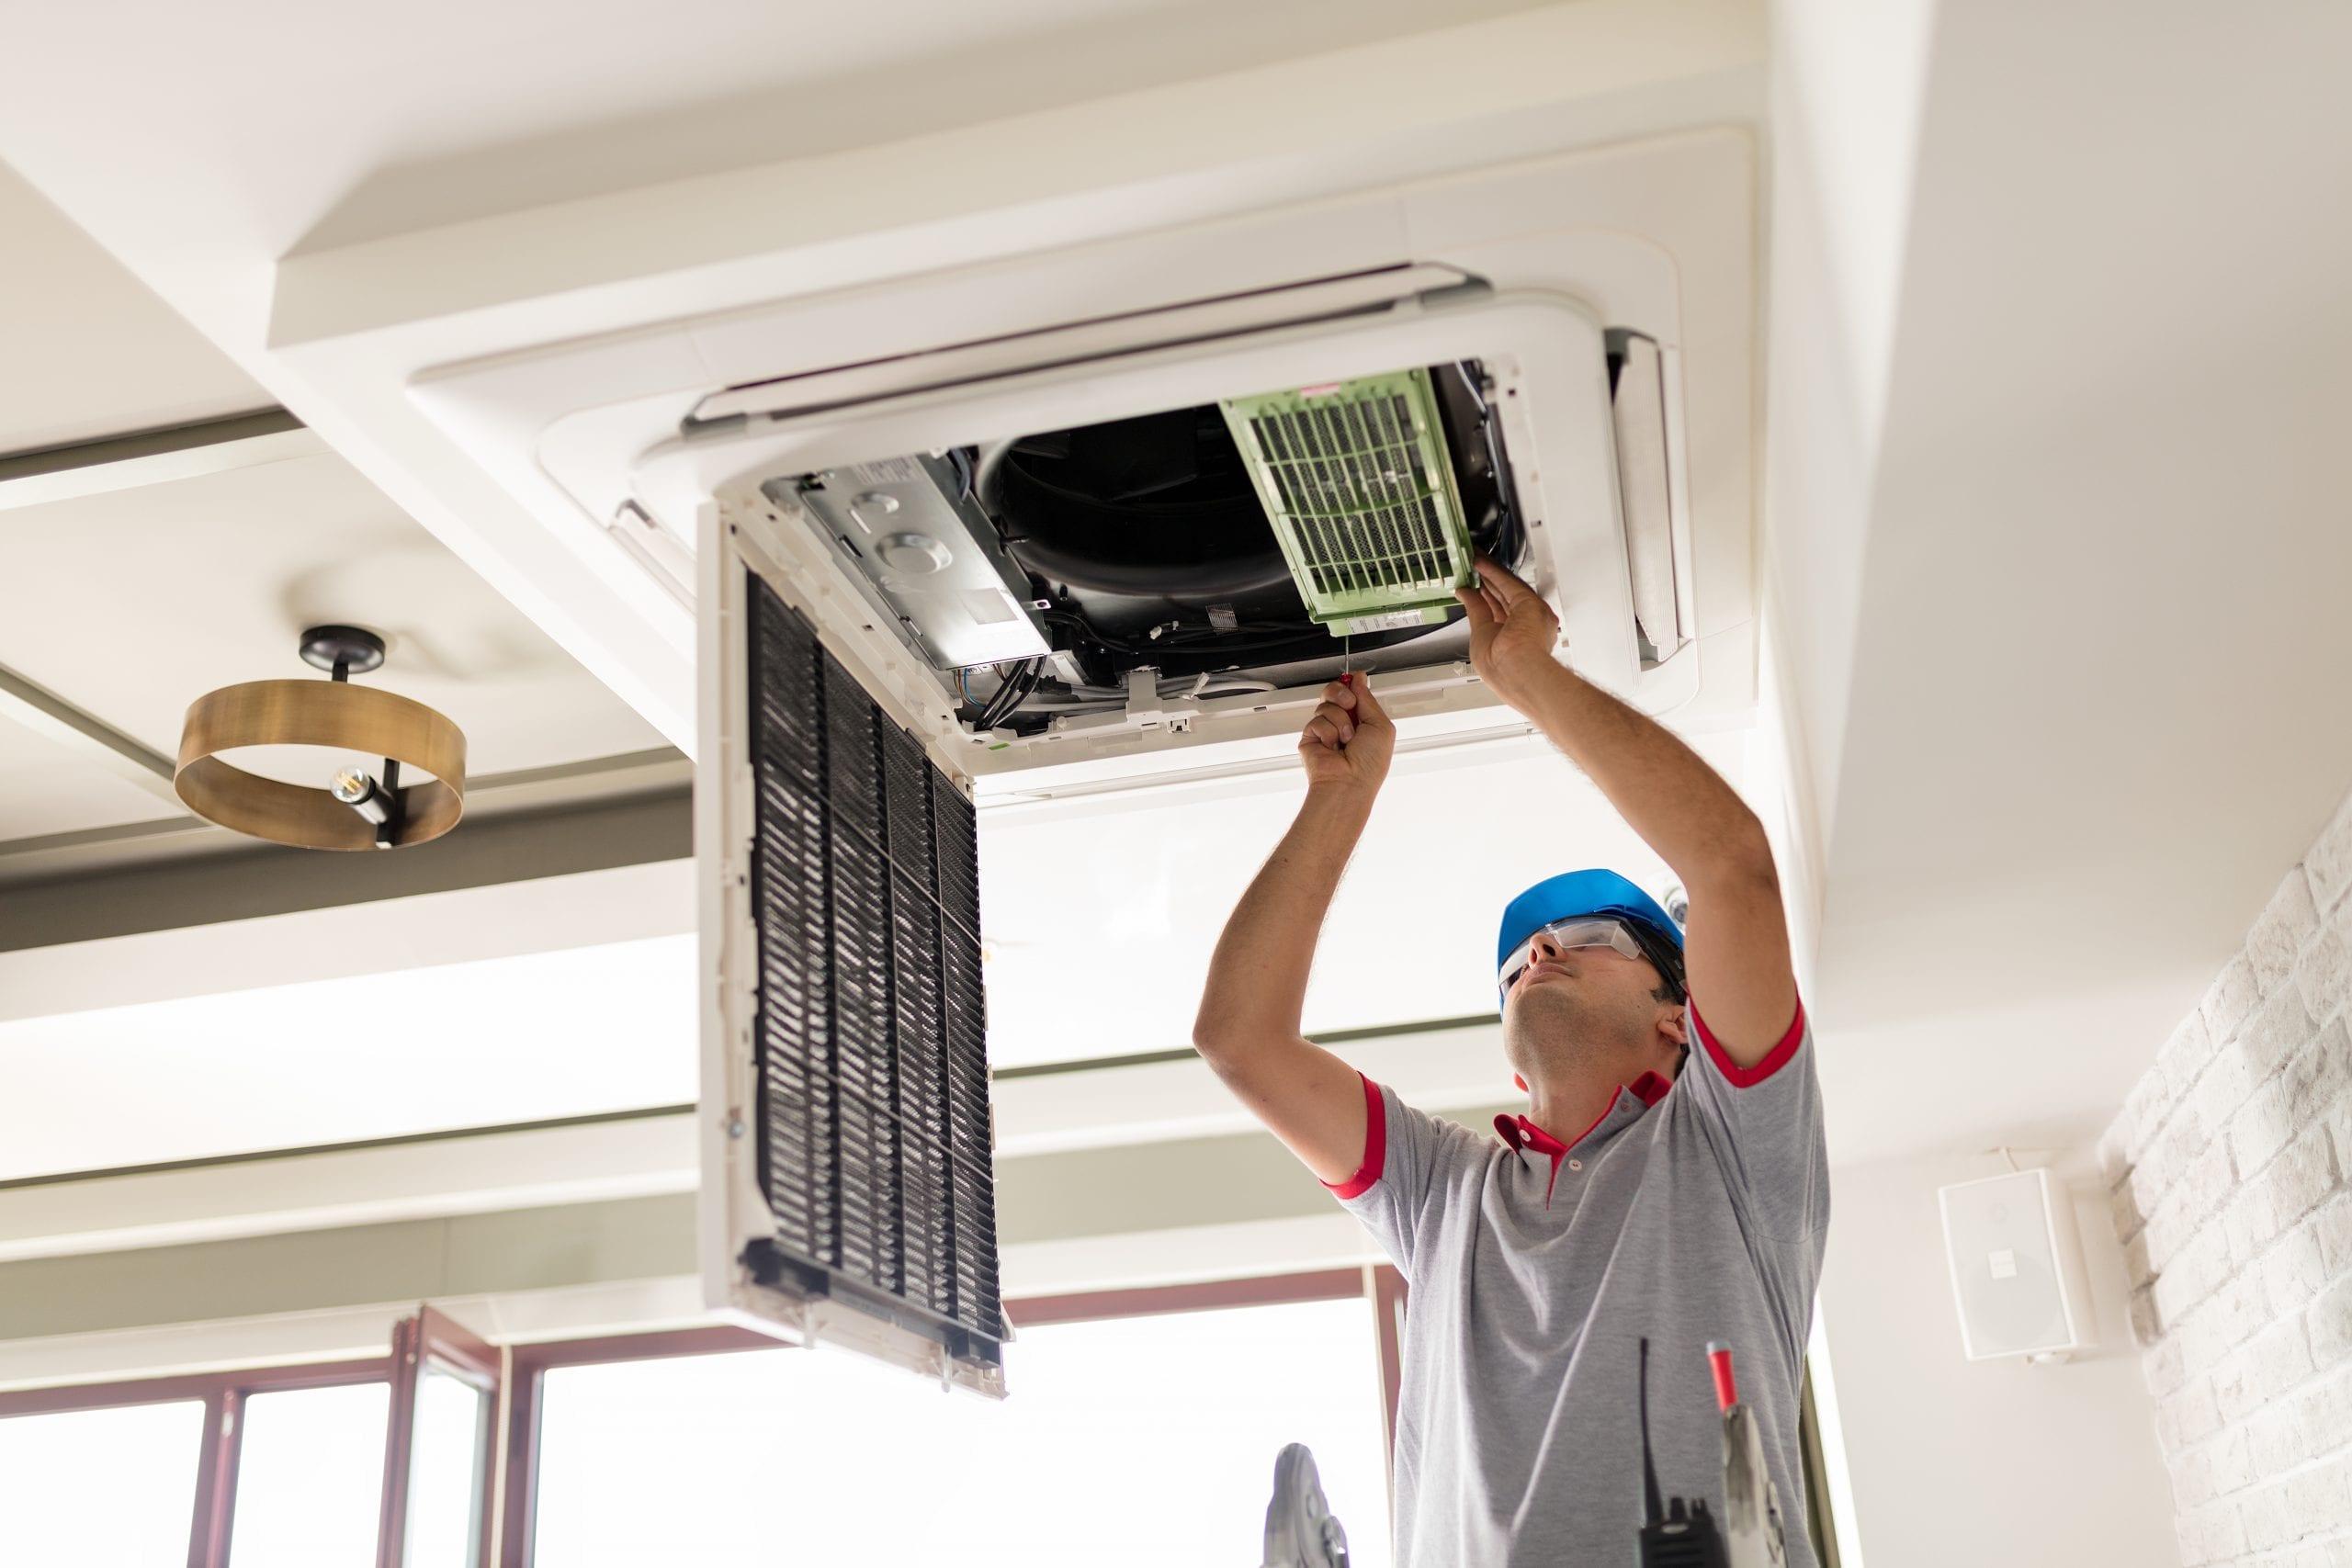 Installateur die airco schoon maakt